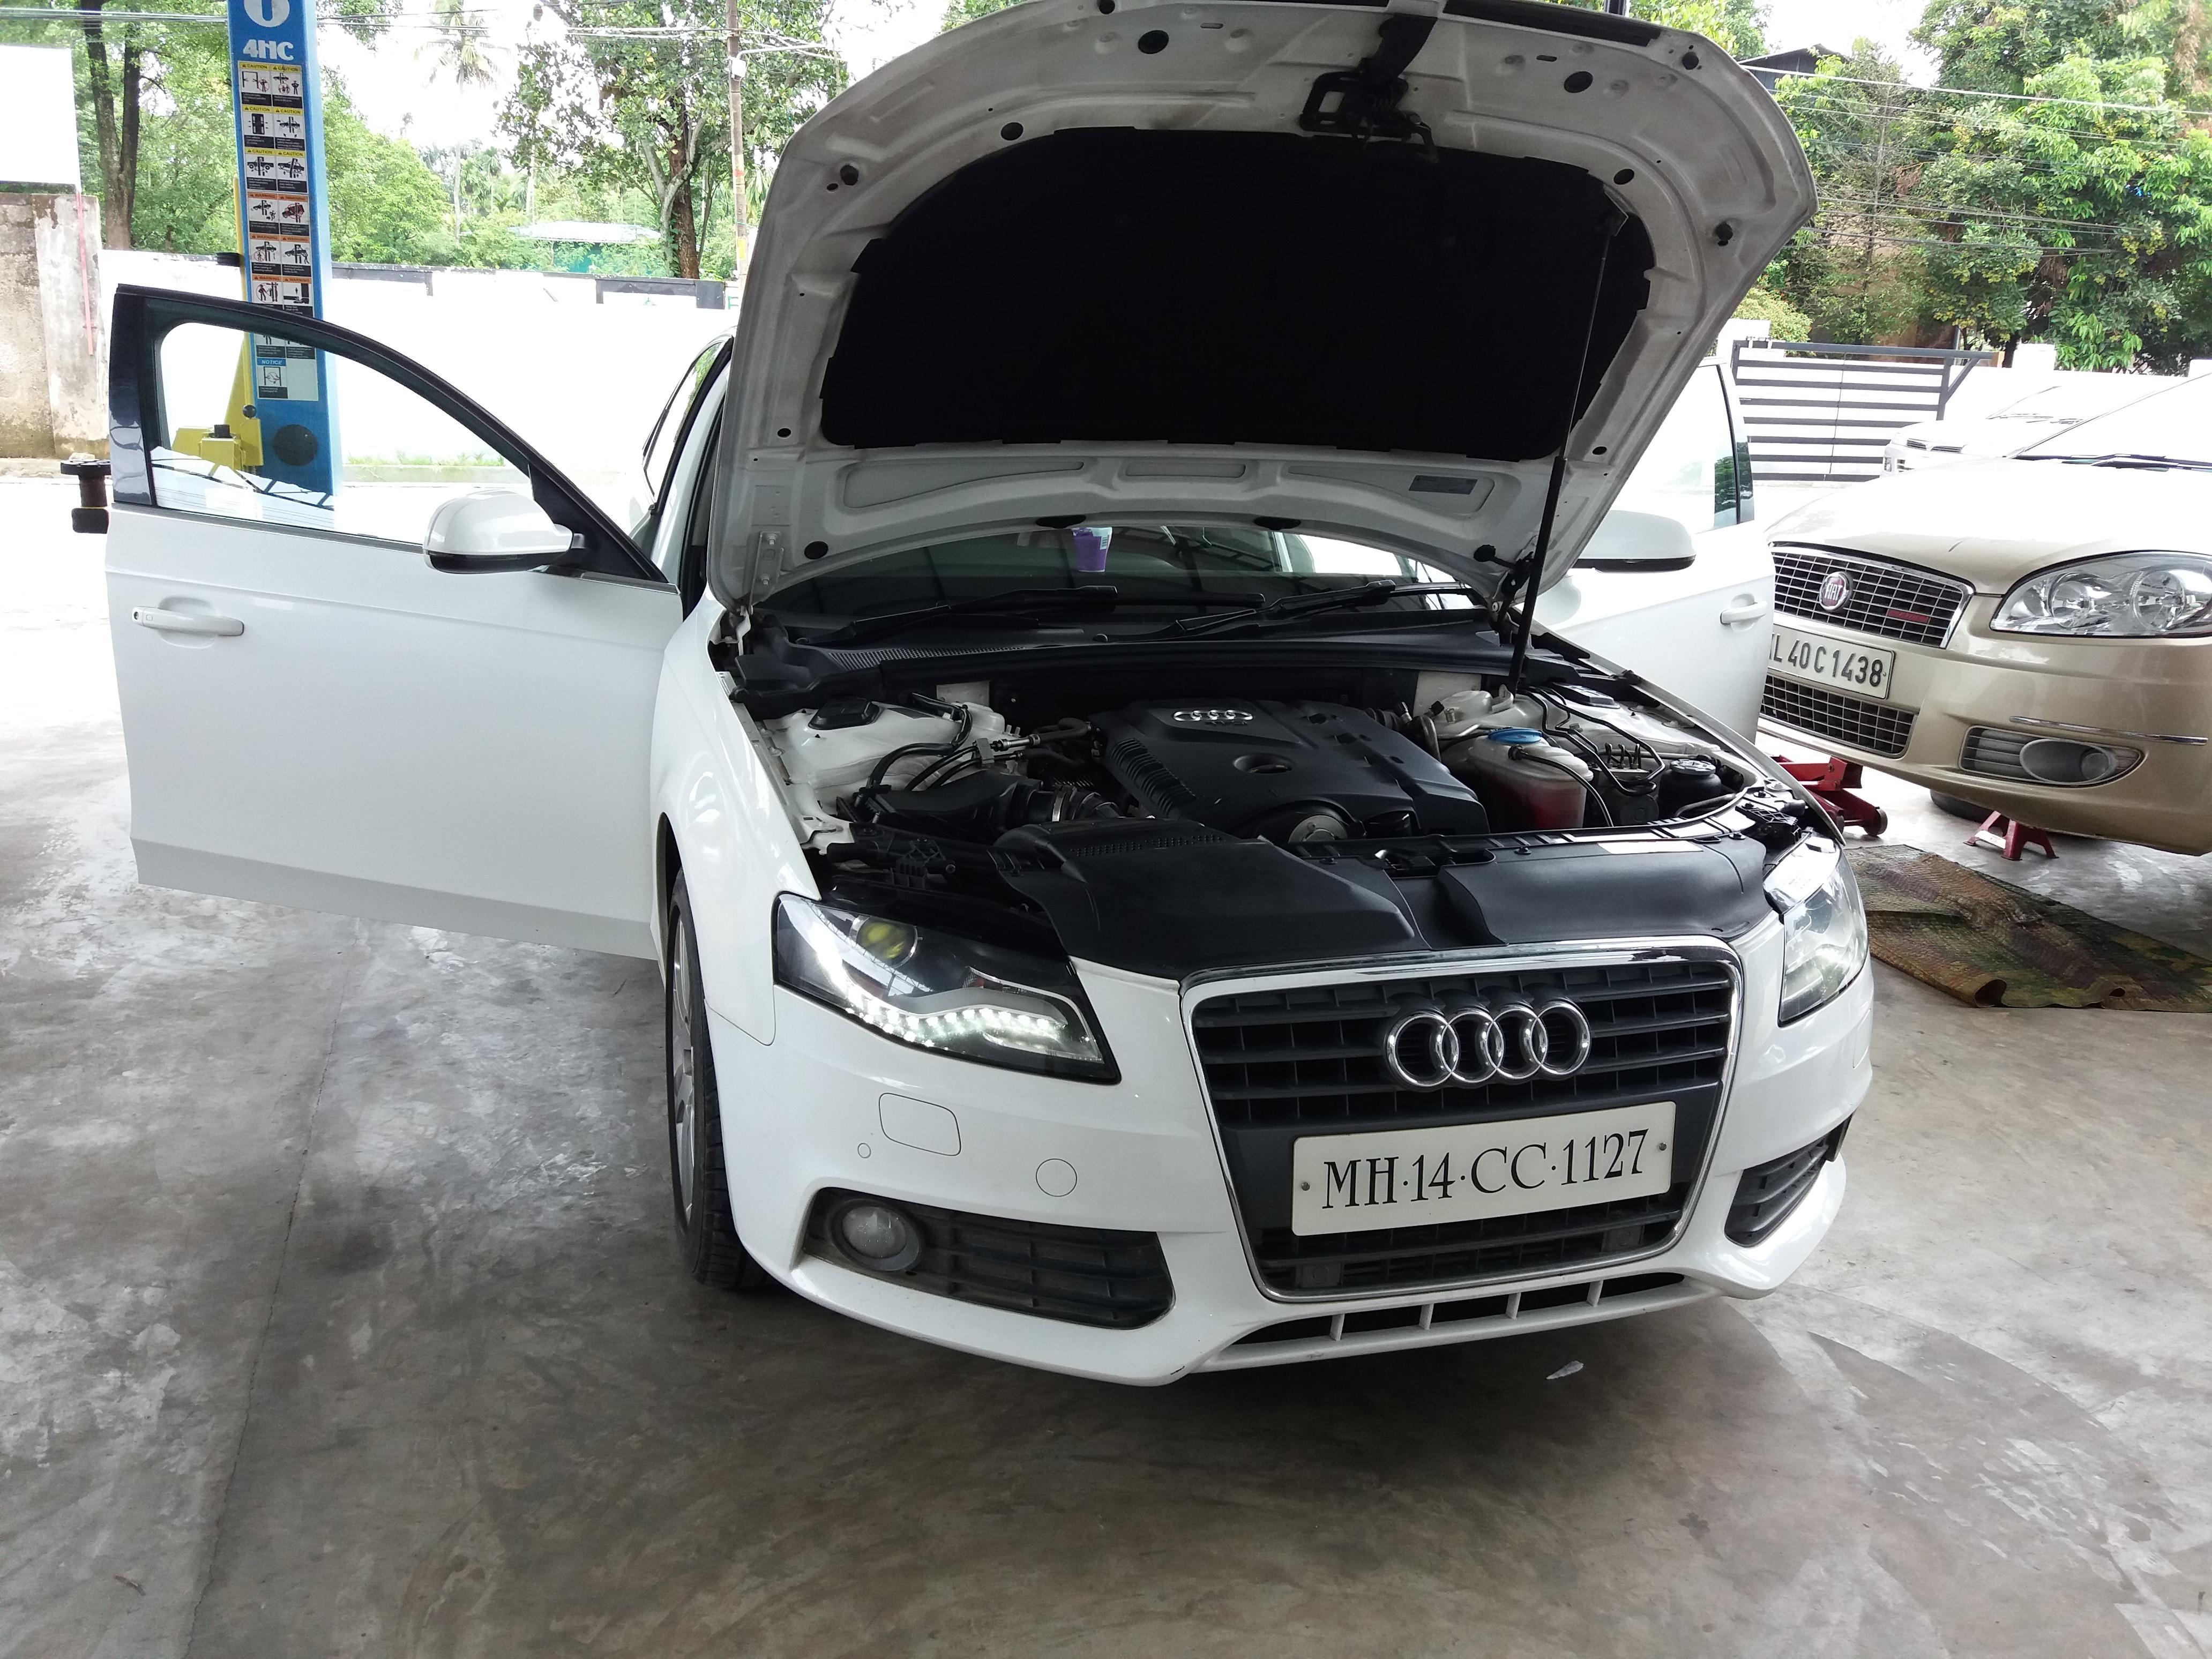 Audi repair and service center